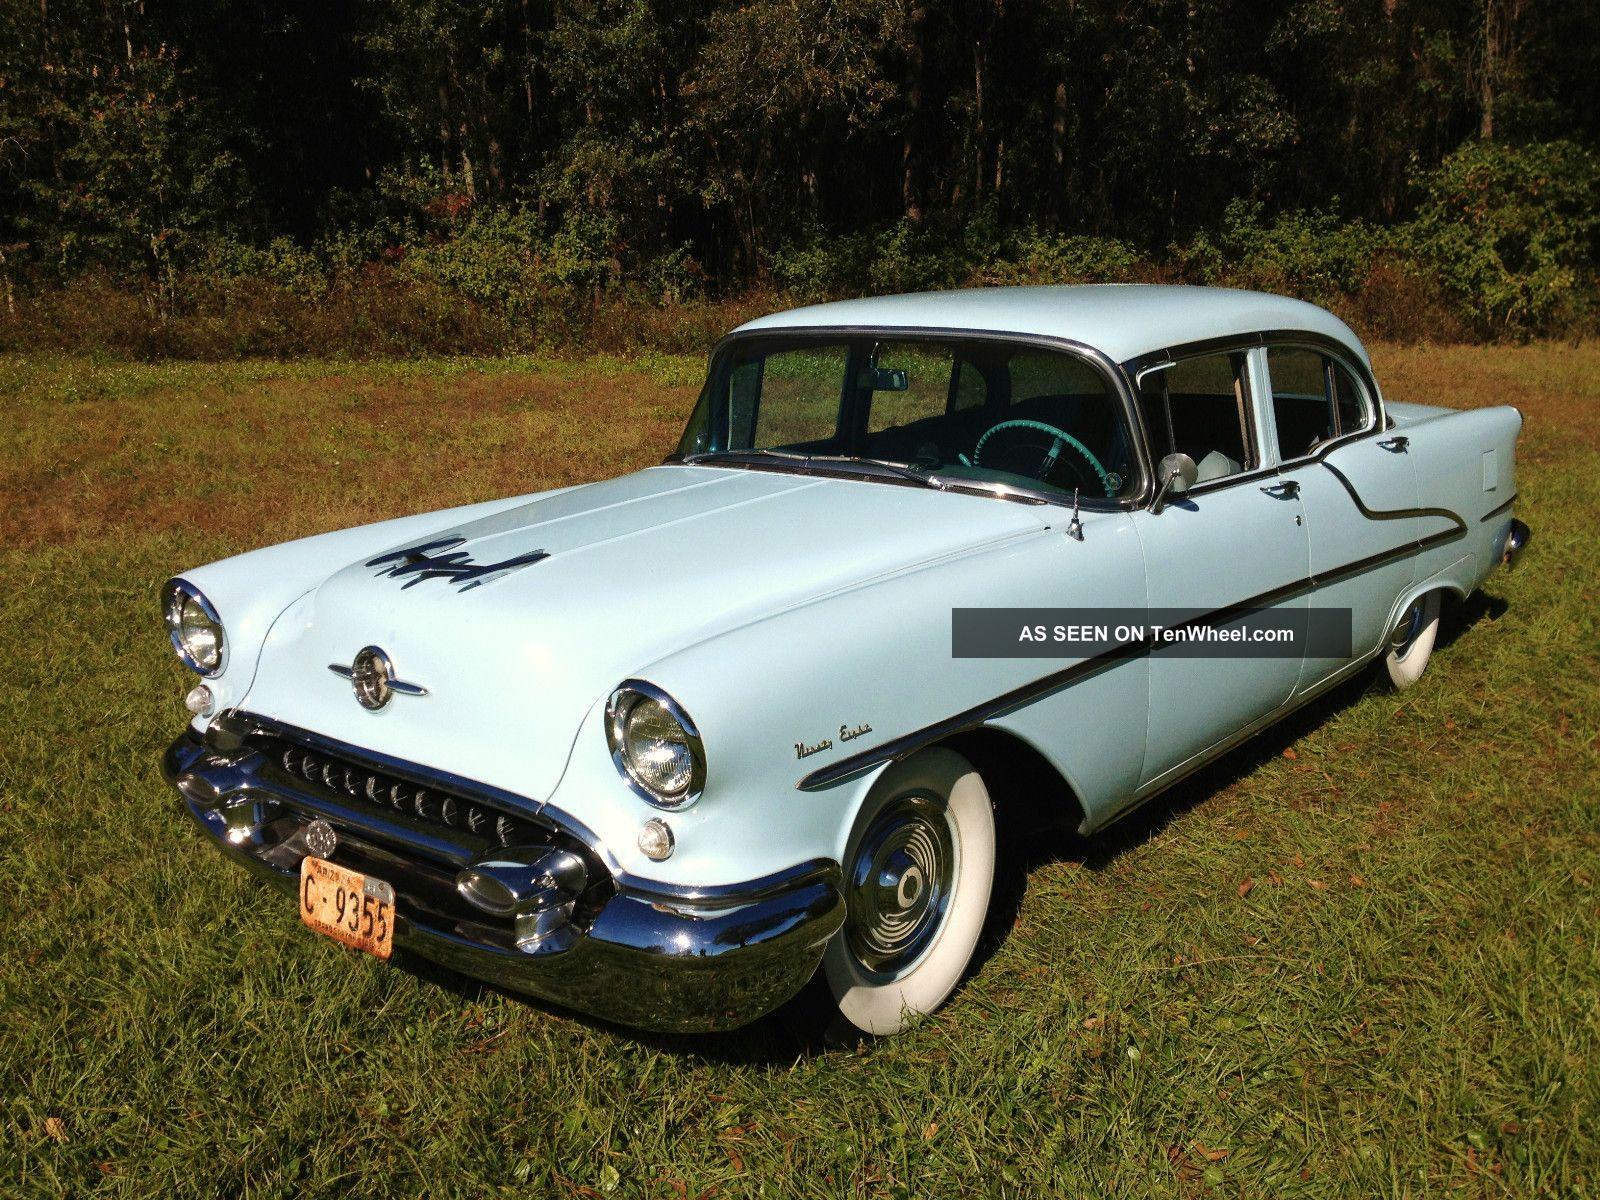 1955 Oldsmobile Survivor Show Car W / Rare Options (55 56 57) Ninety-Eight photo